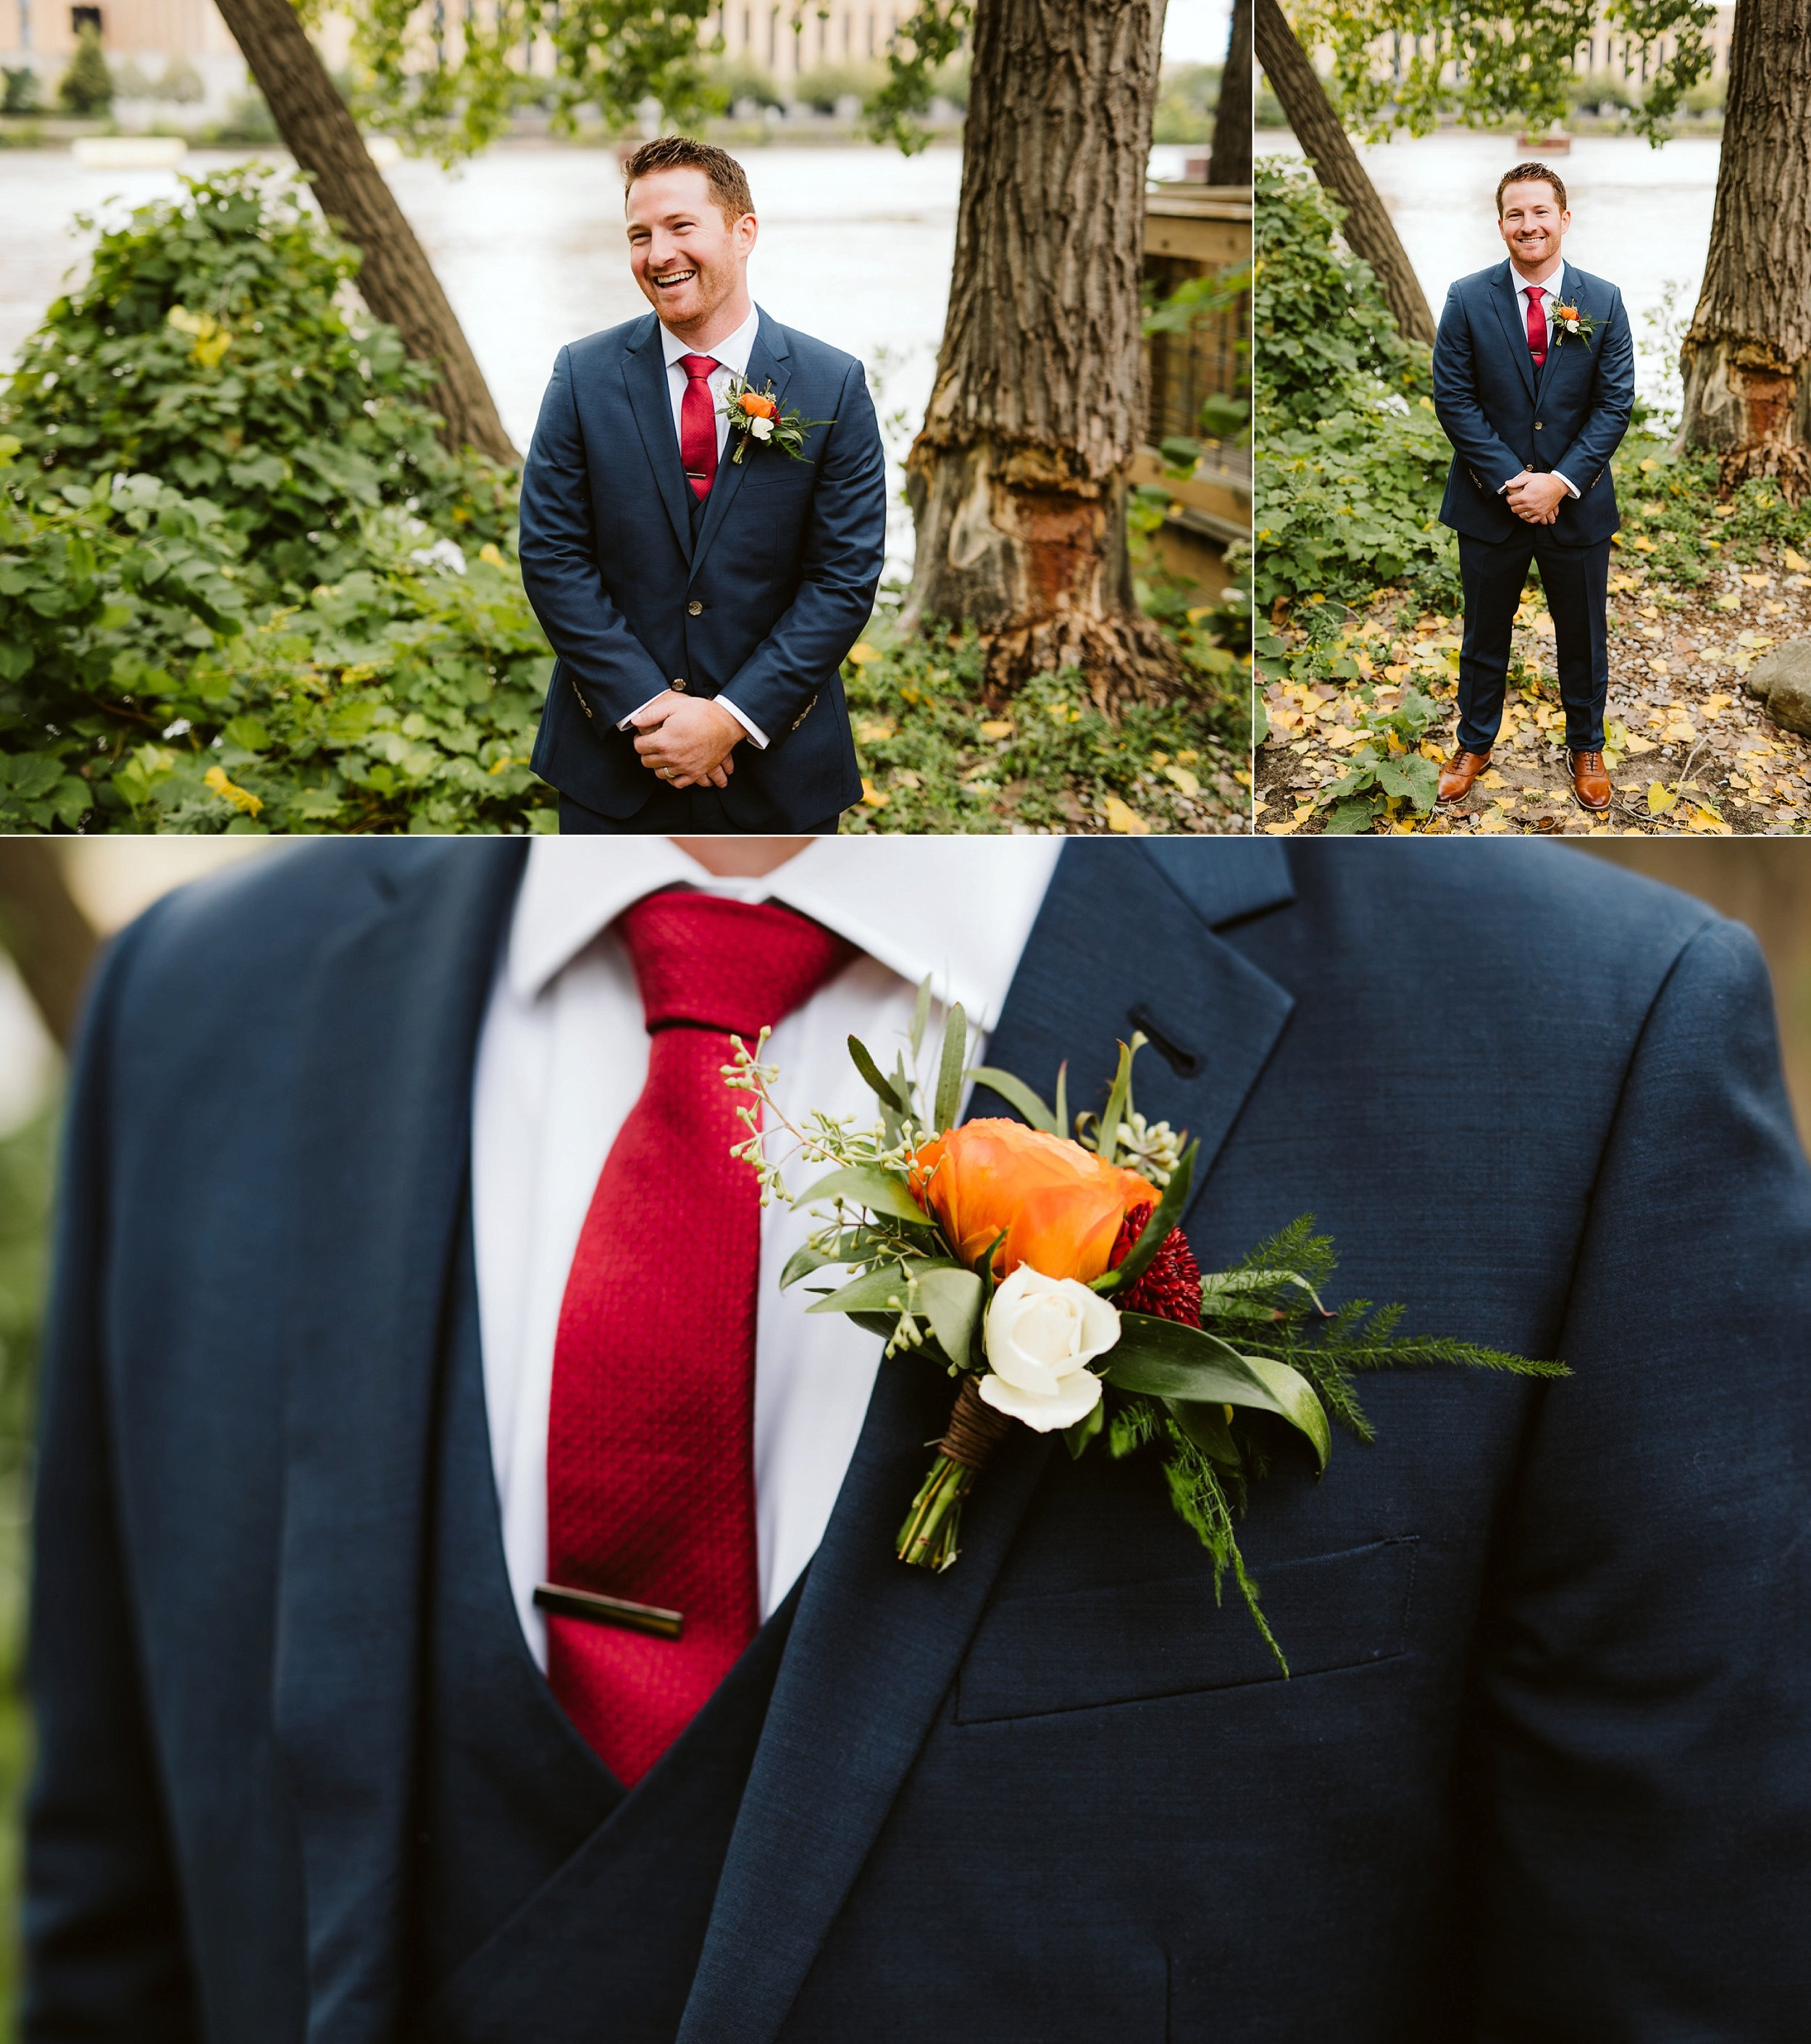 Nicollet-Island-Pavilion-Minneapolis-September-Coral-Navy-Wedding-44.jpg